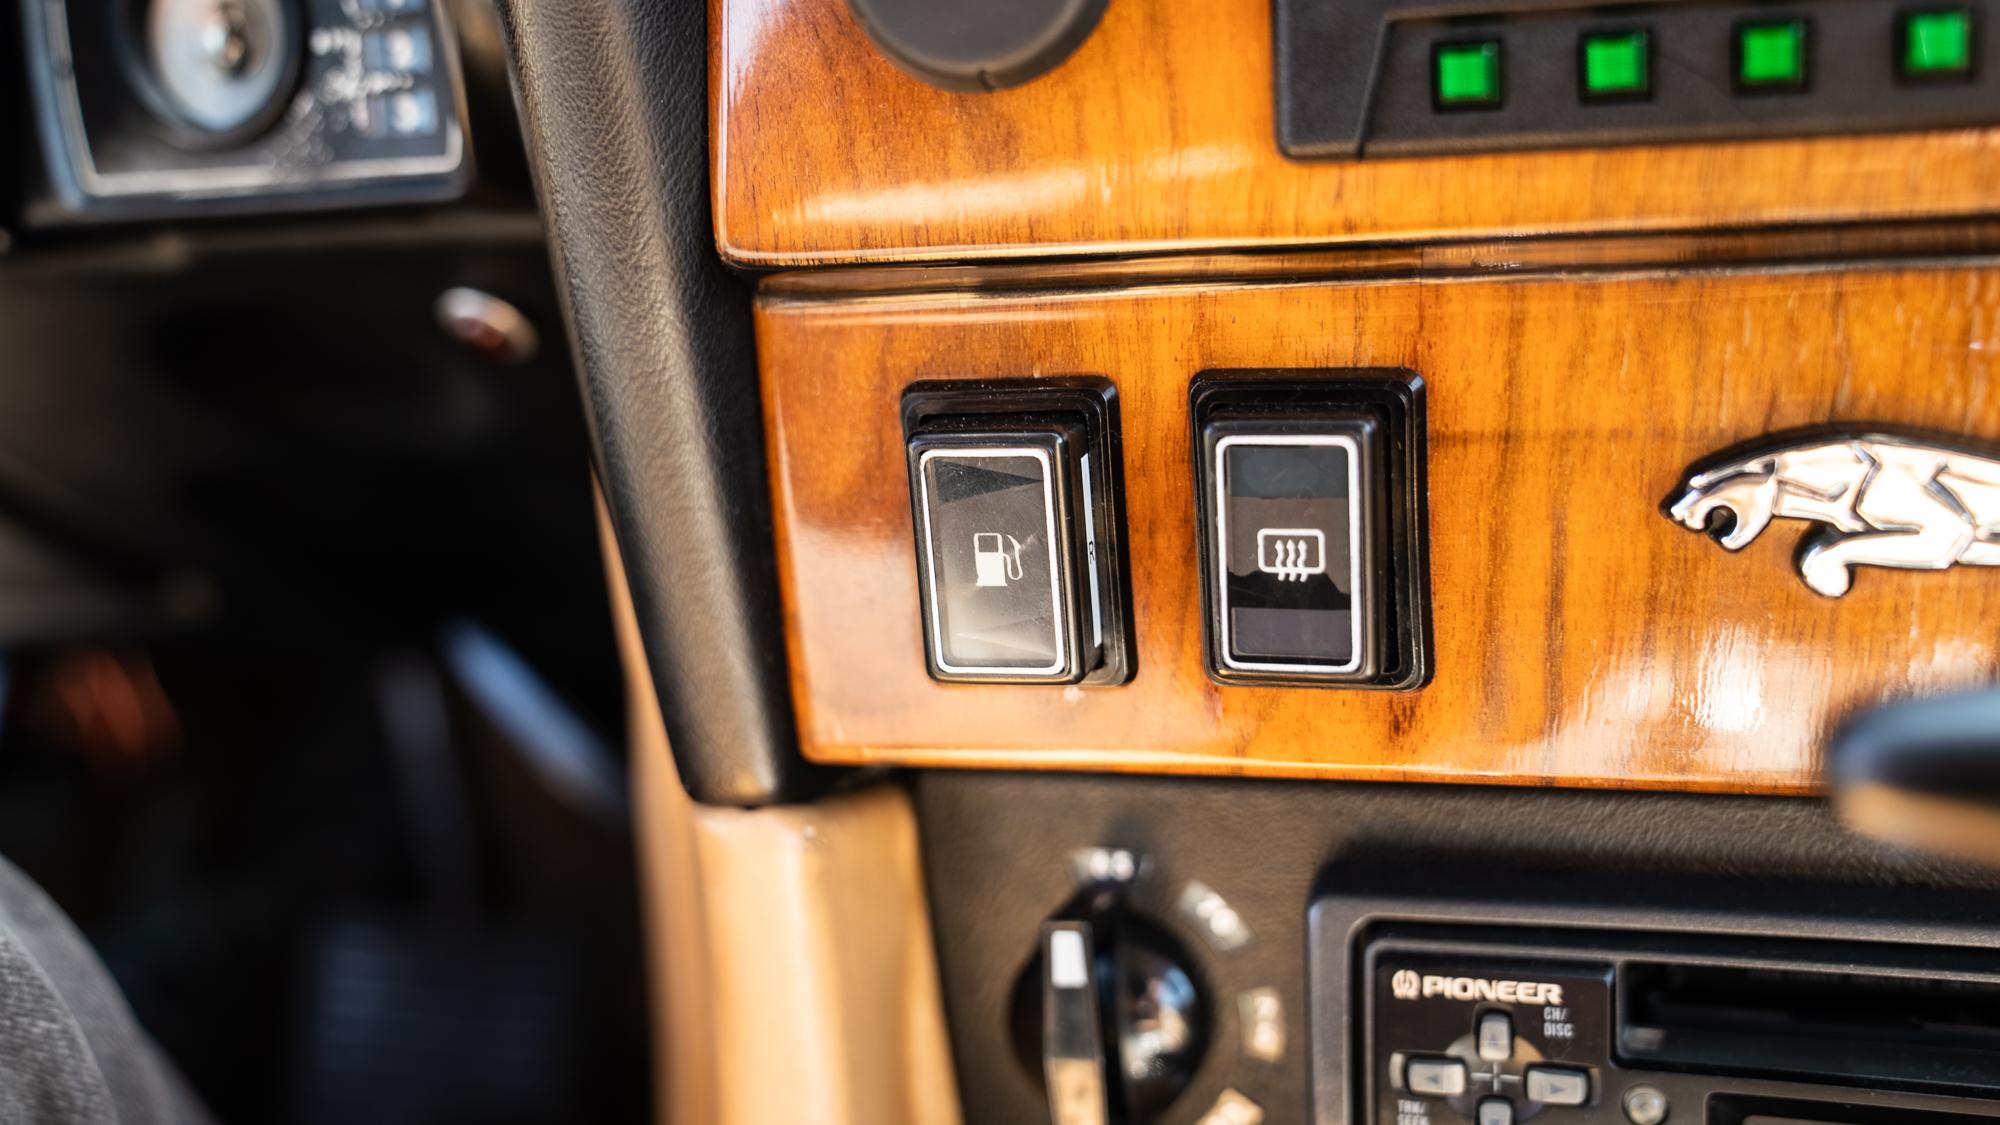 1986 Jaguar XJ6 fuel tank switch